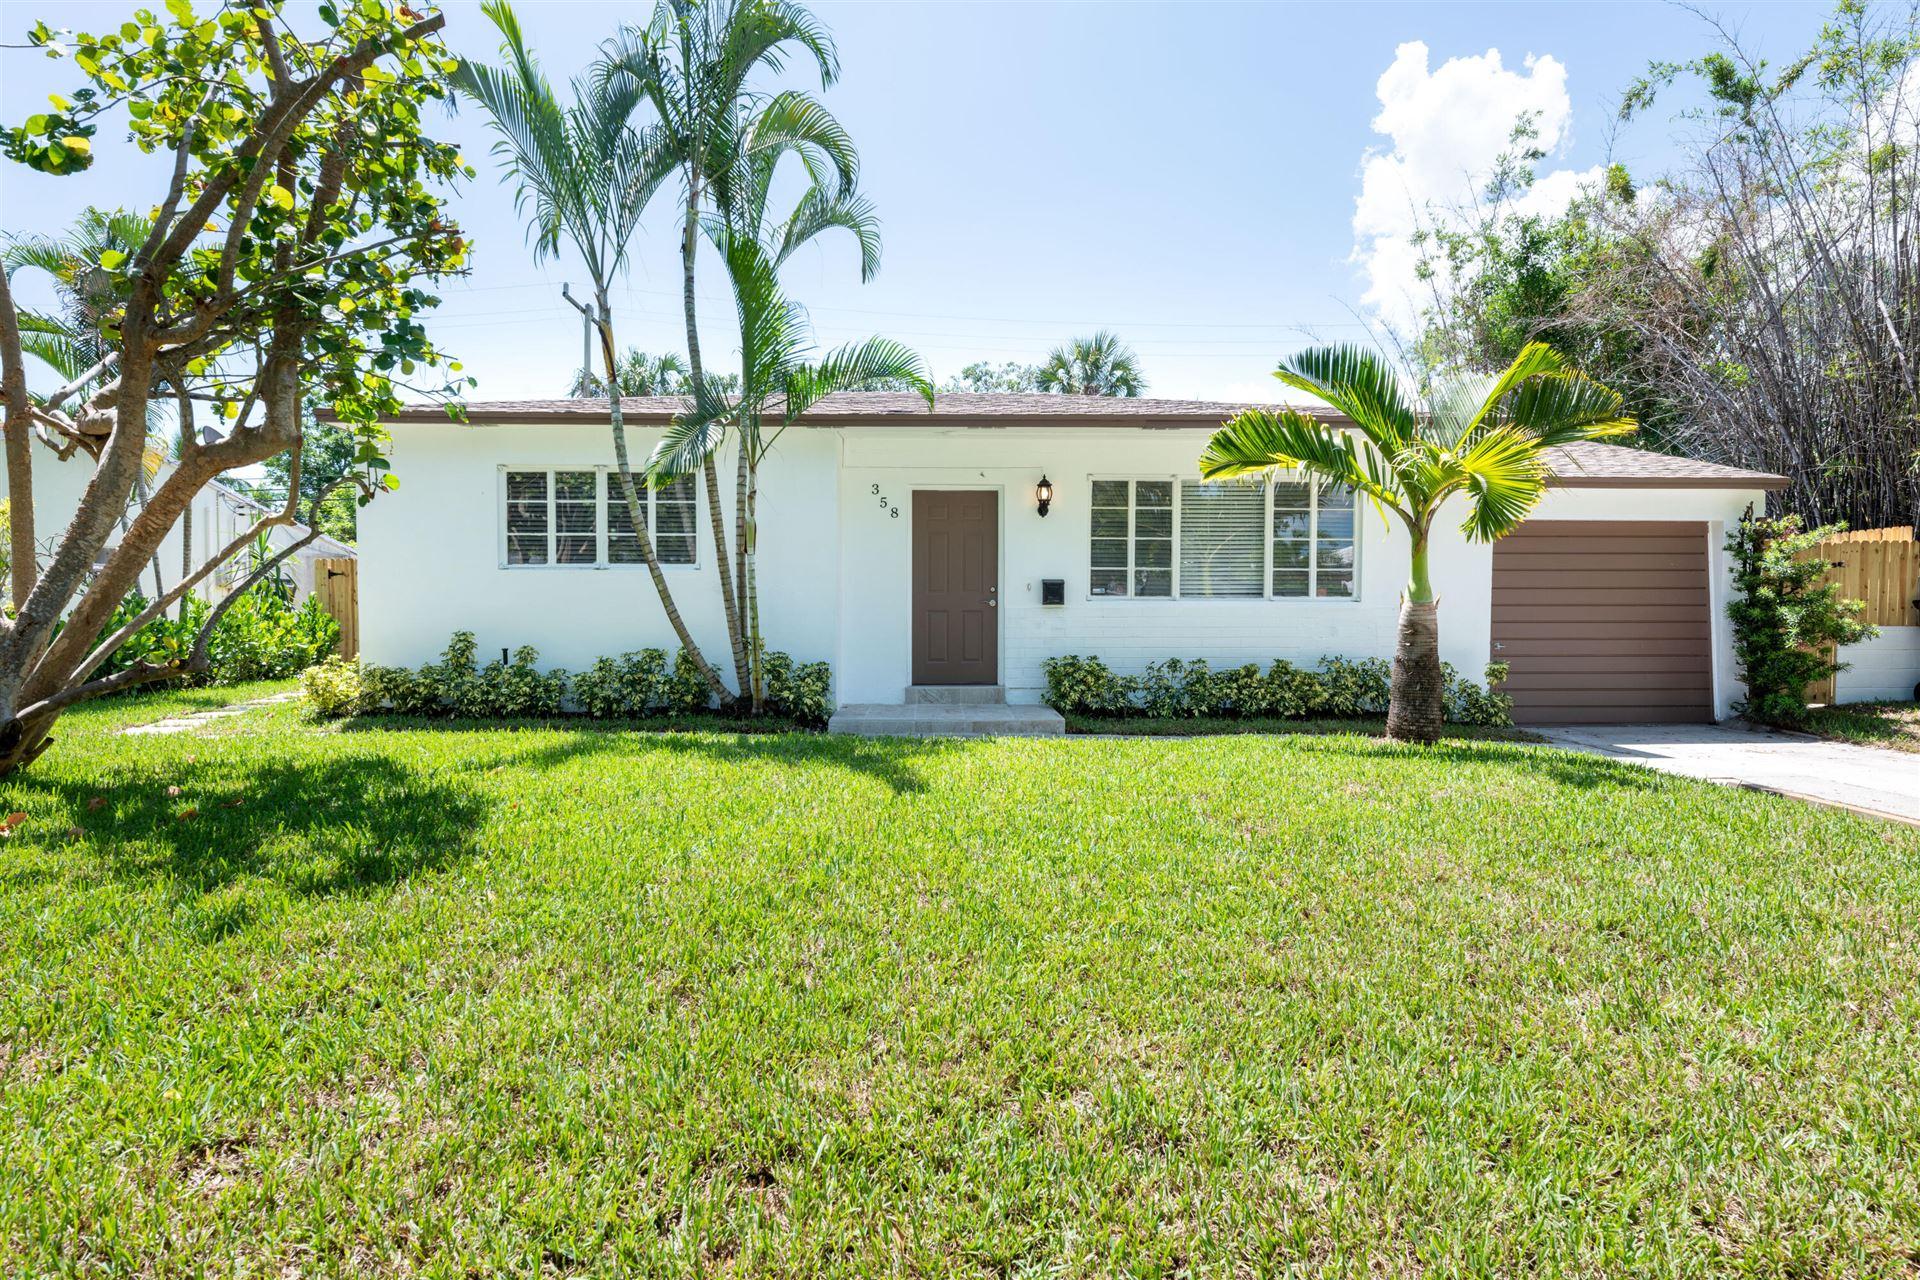 358 Putnam Ranch Road, West Palm Beach, FL 33405 - MLS#: RX-10744788